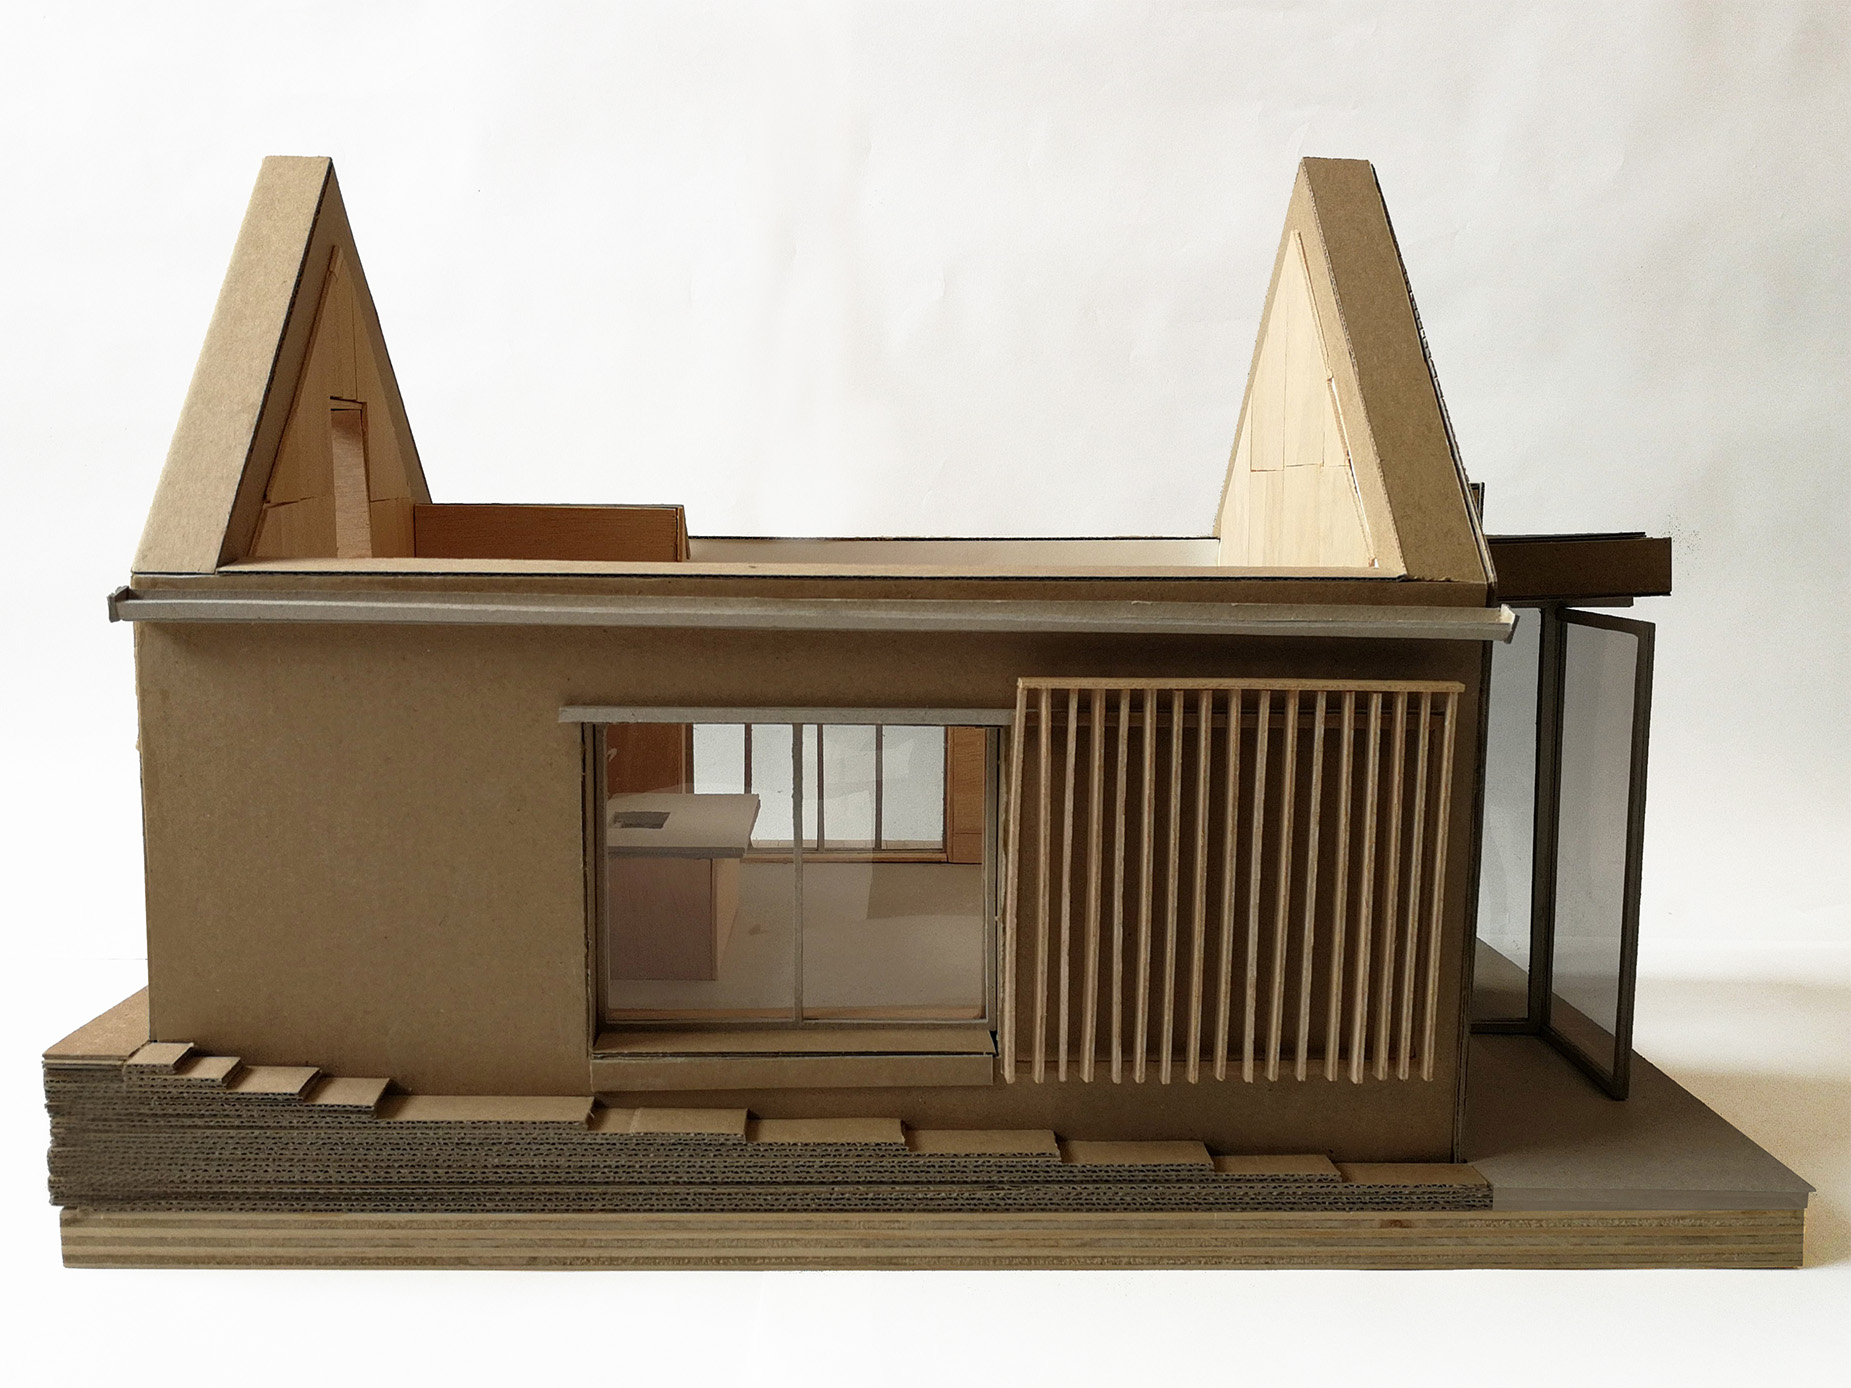 harper-perry-architects-barn-conversion-model-development-internal-layout-open-kitchen-side-elevation